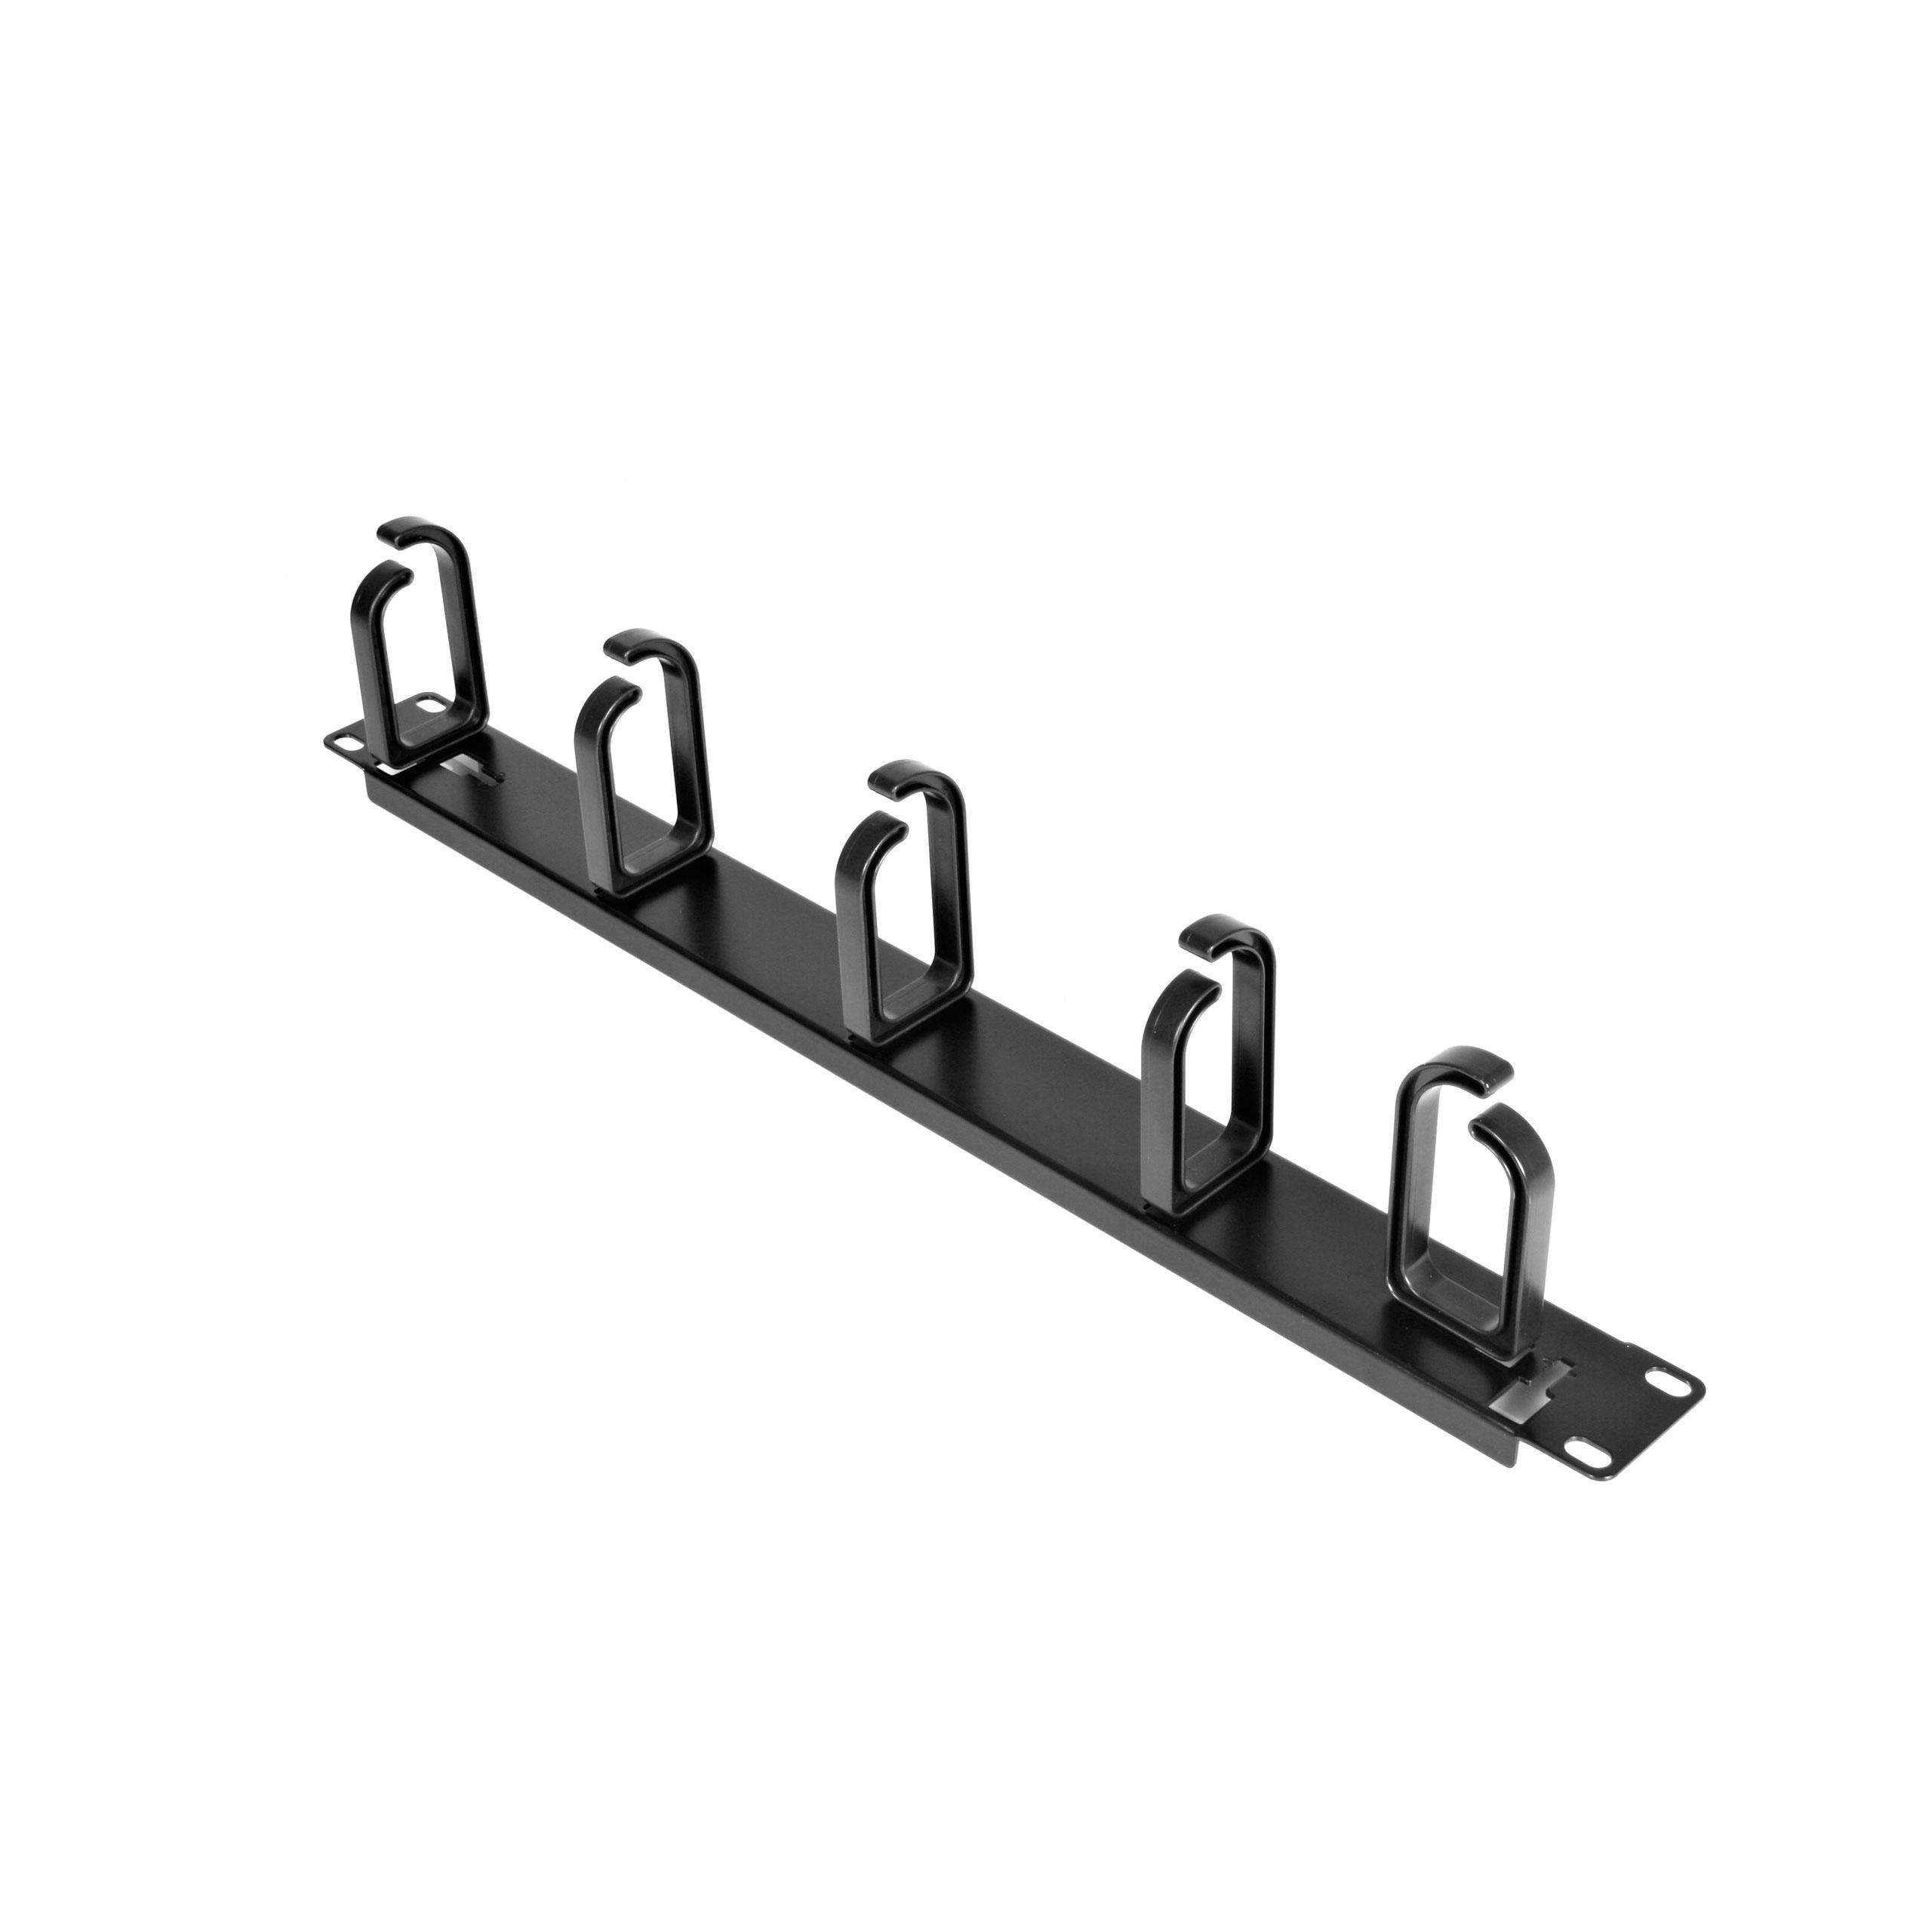 Amazon.com: StarTech.com 1U 19-Inch Metal Rackmount Cable